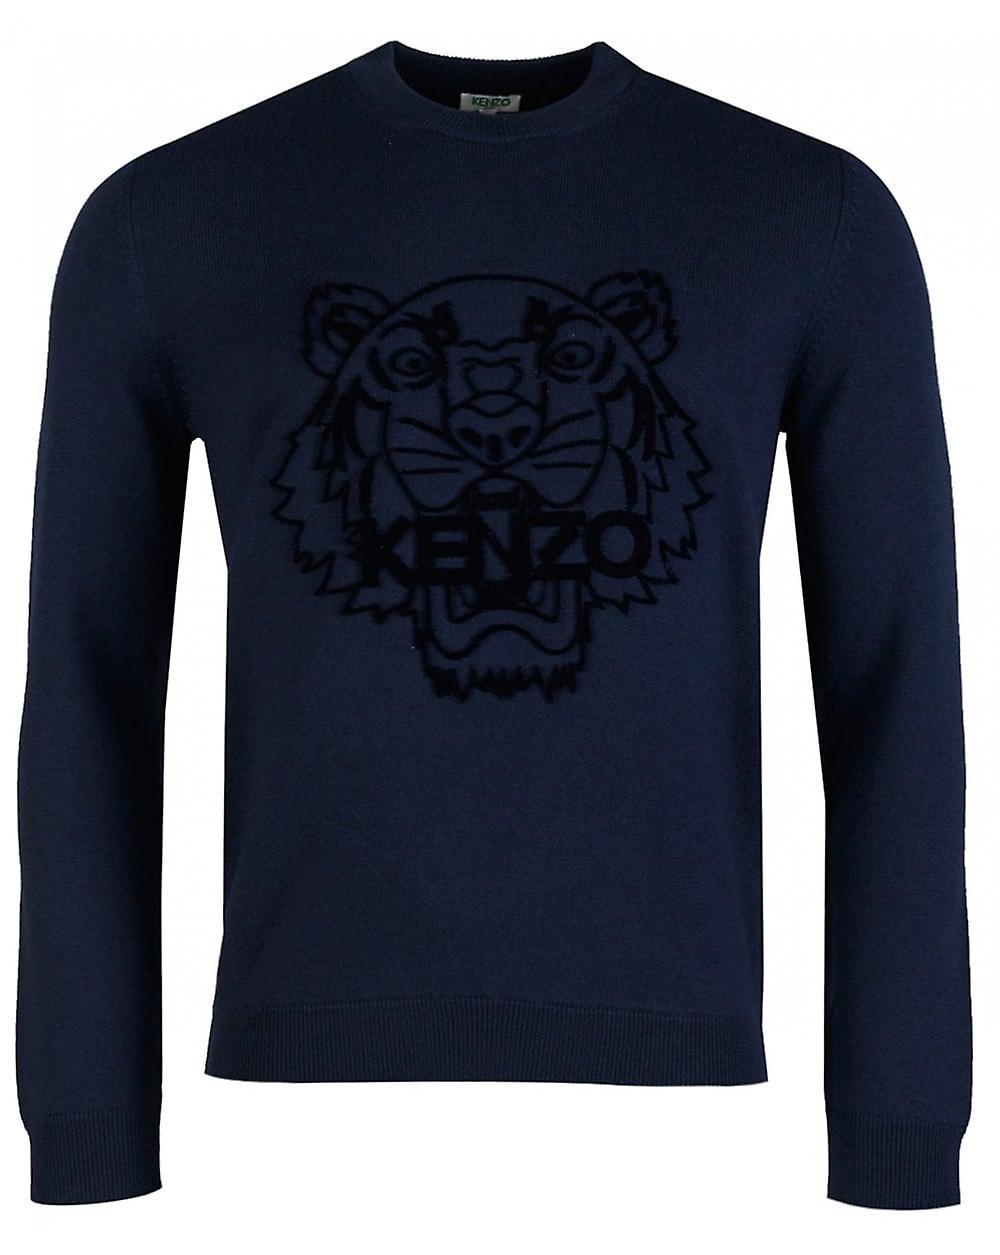 Kenzo broderad Tiger tröja